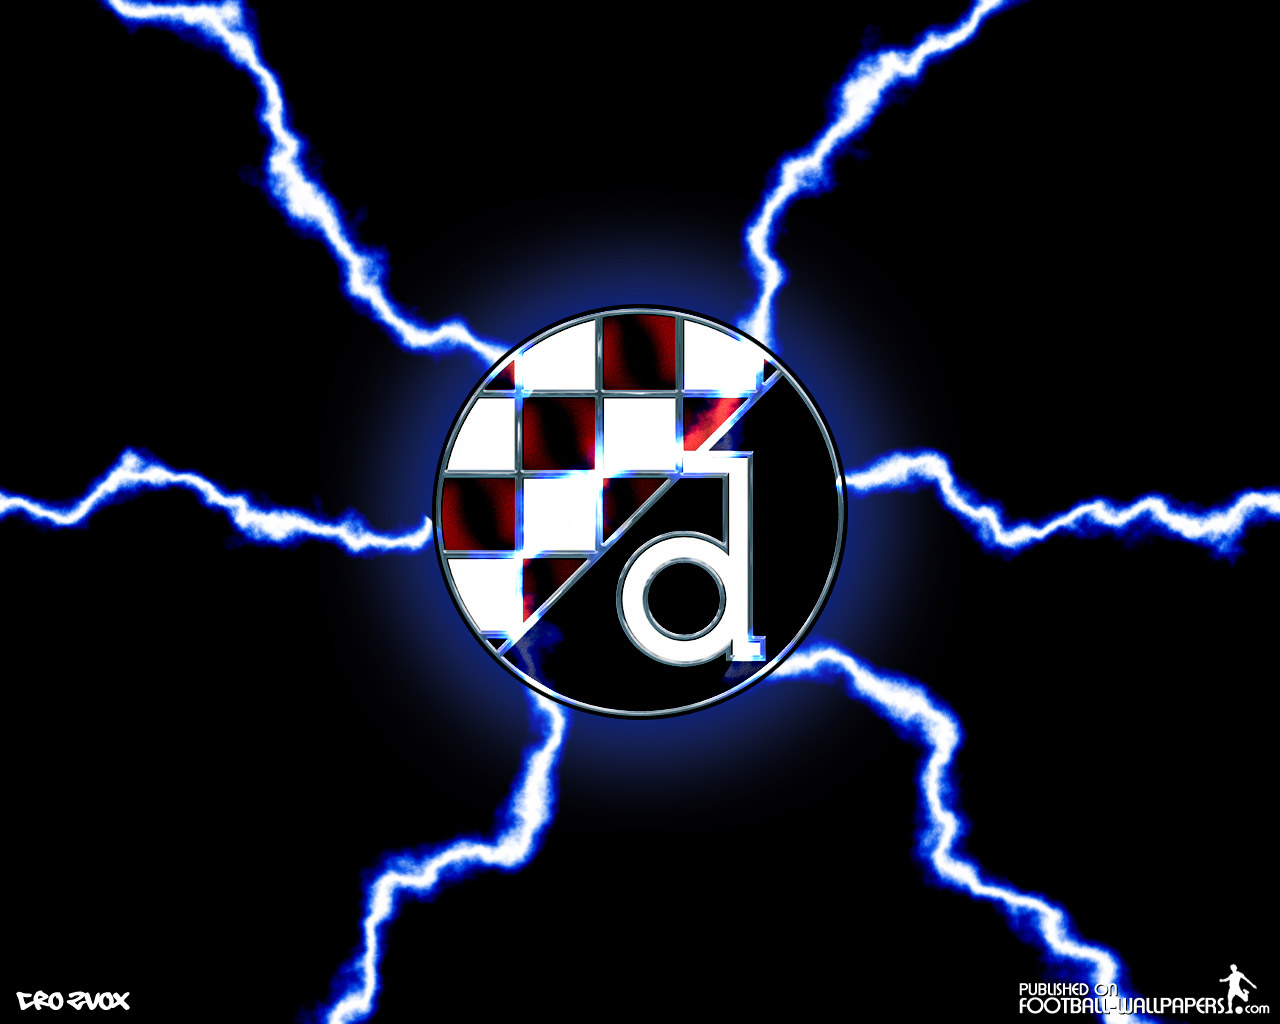 Chùm ảnh: Dinamo Zagreb jersey (7)